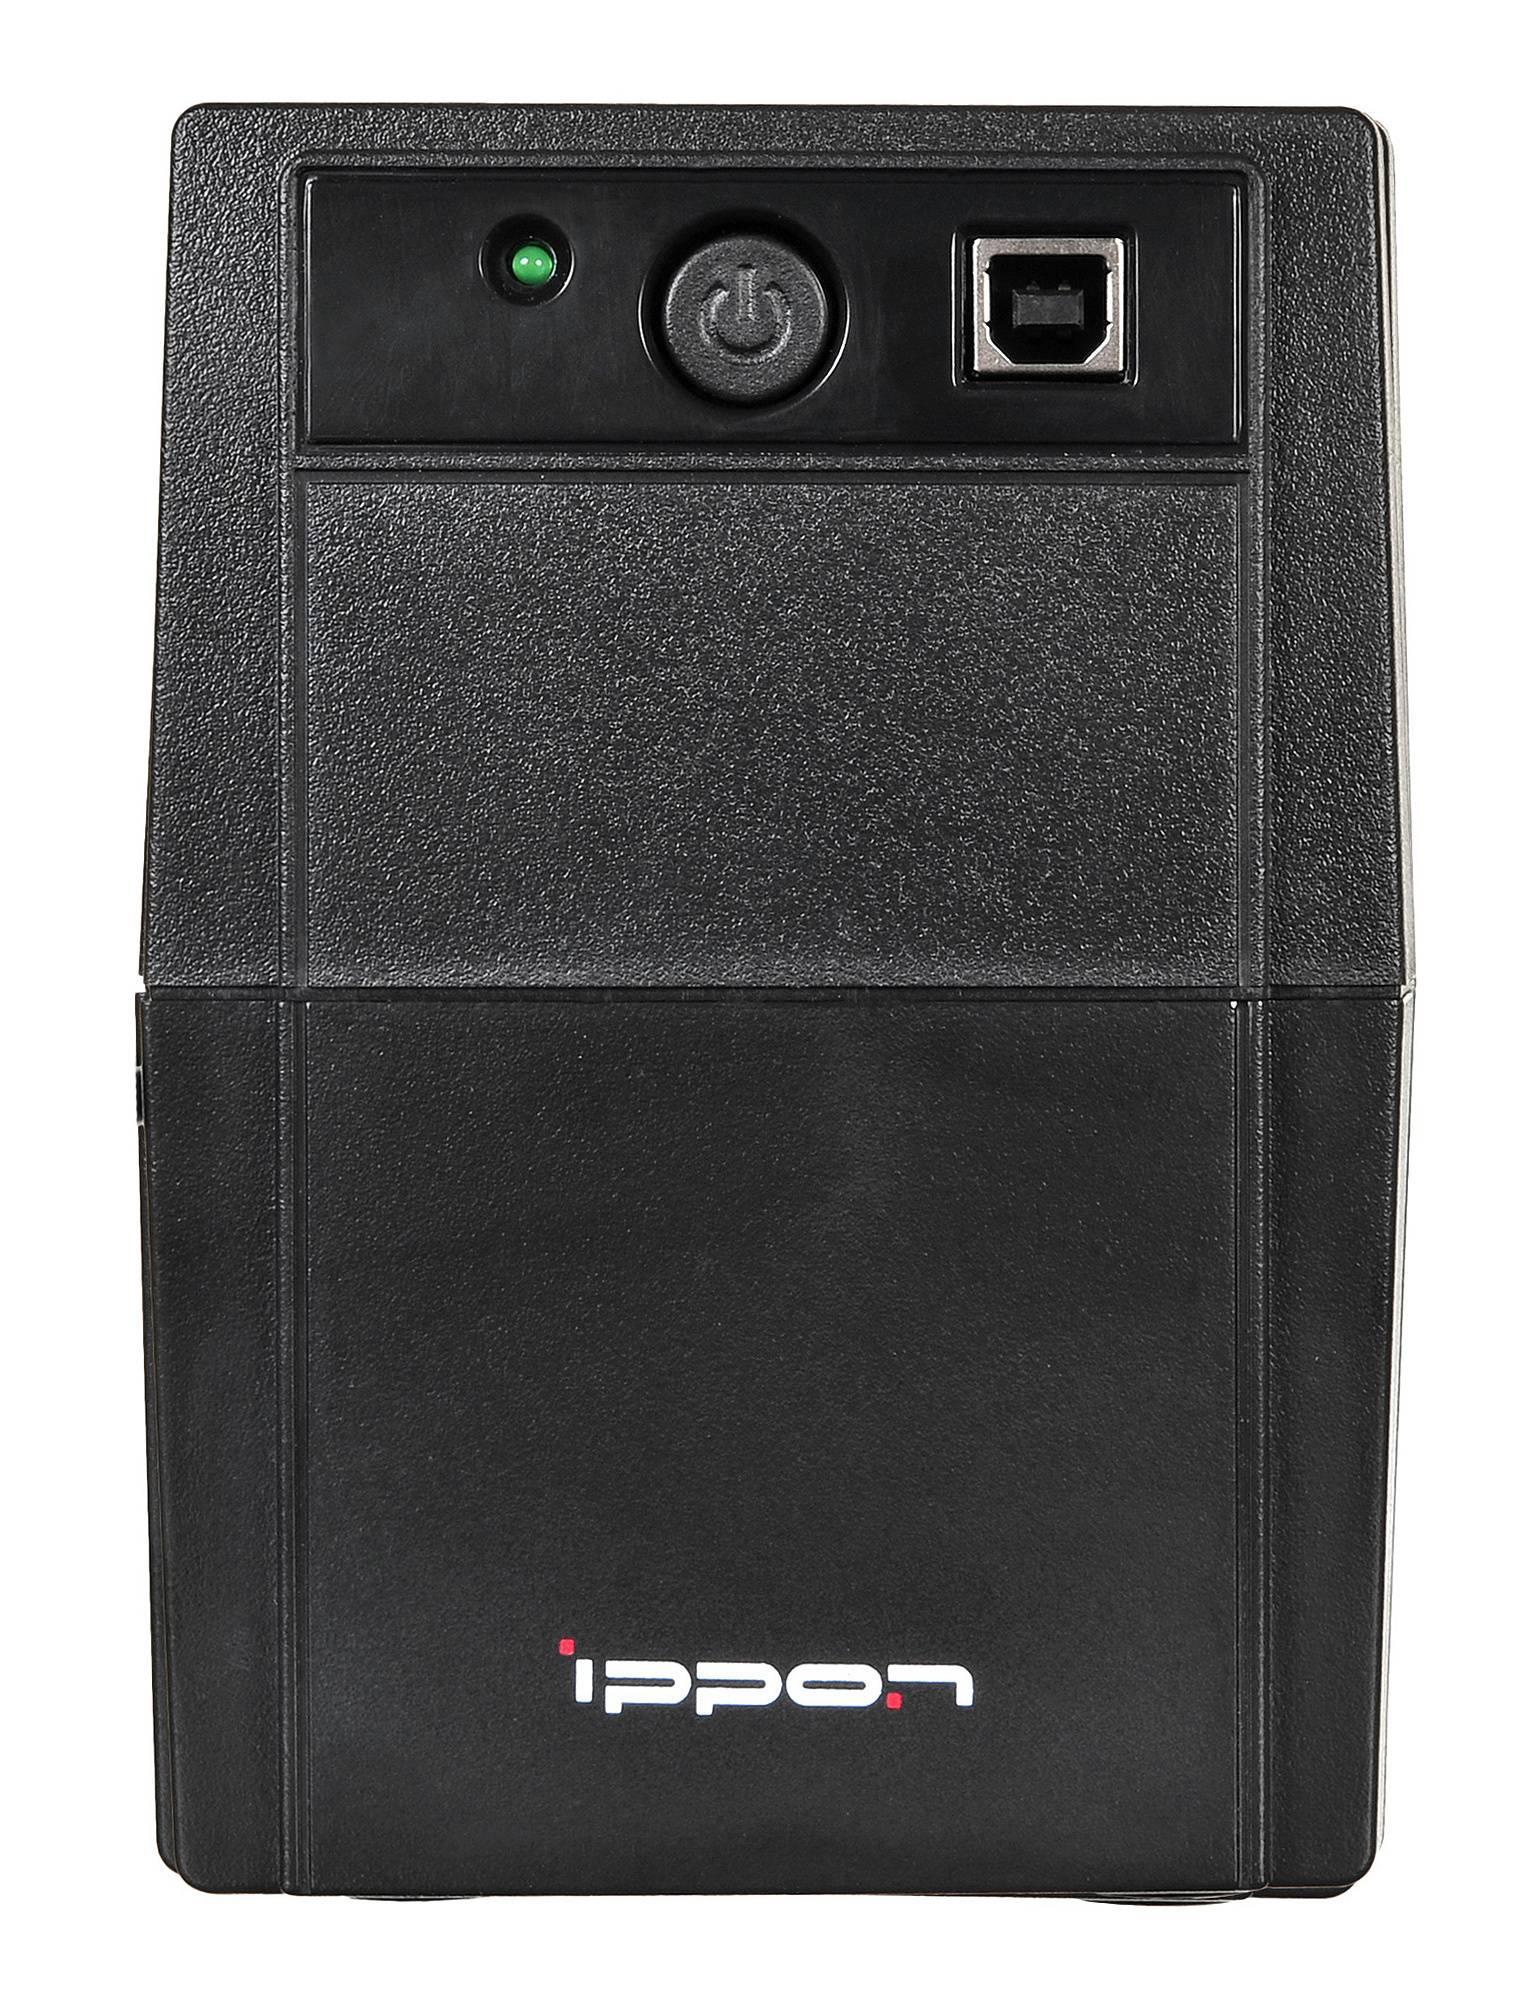 ИБП Ippon Back Basic 1050 черный - фото 1